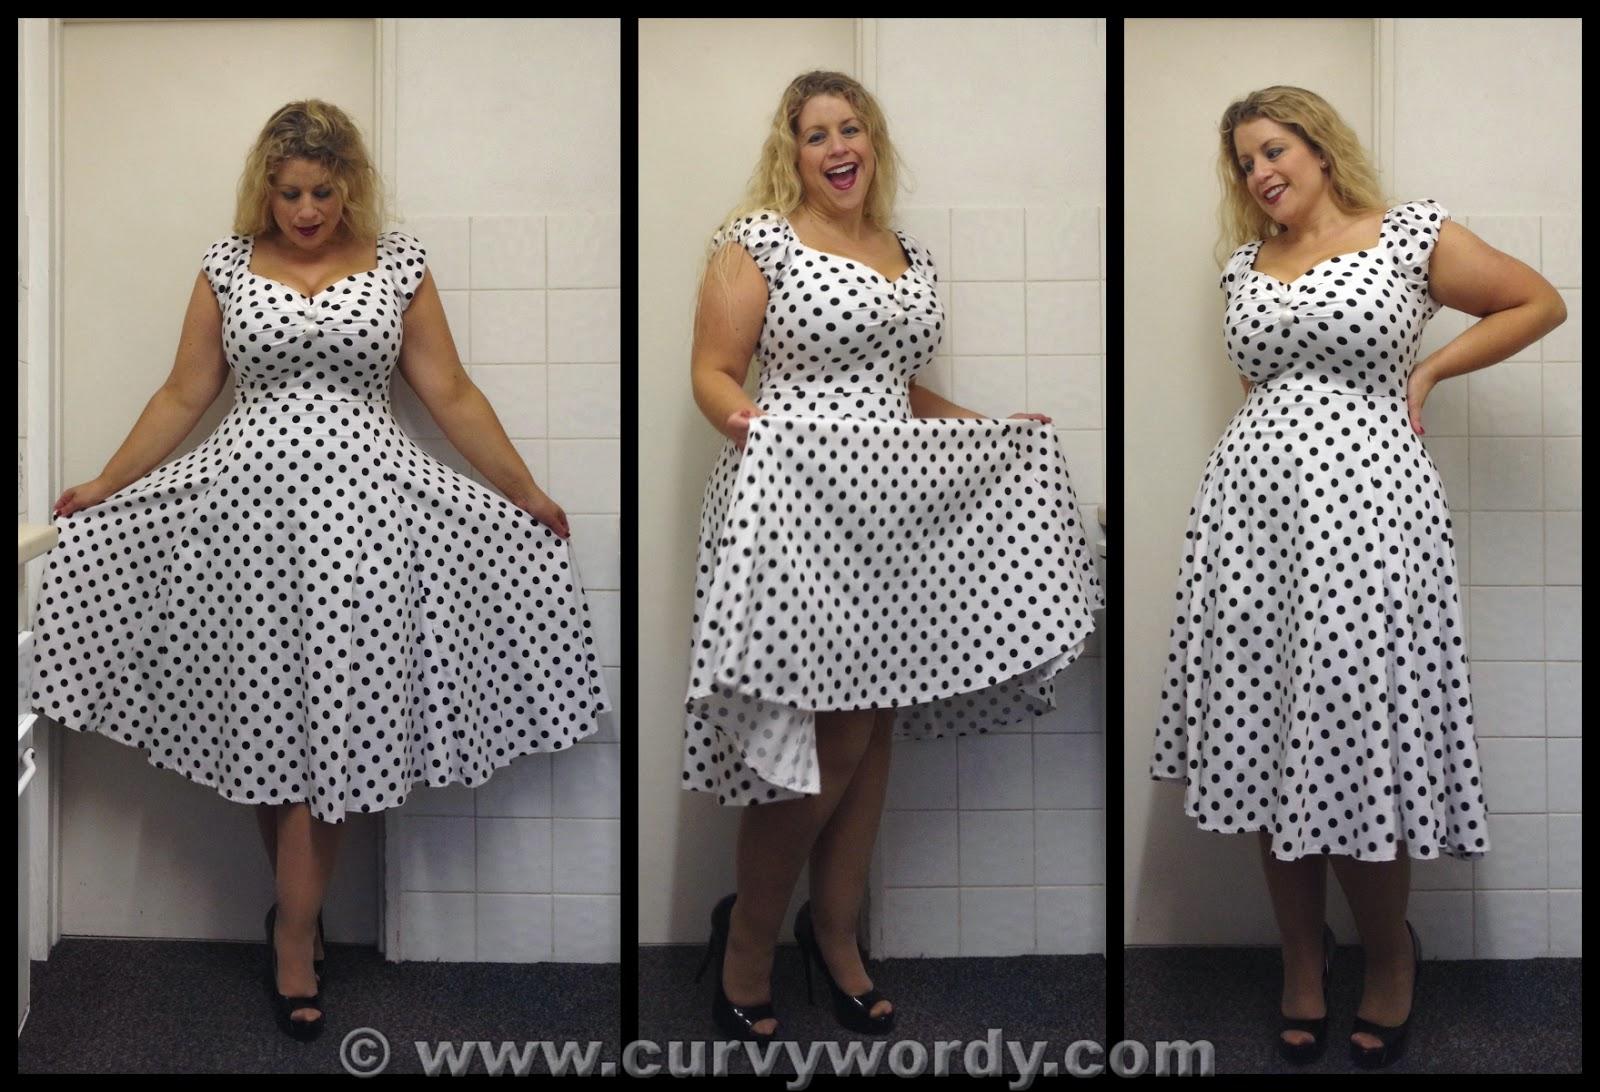 c42fd12c27 Collectif Dolores Doll White Black Polka Dot Dress 12 - Curvy Wordy